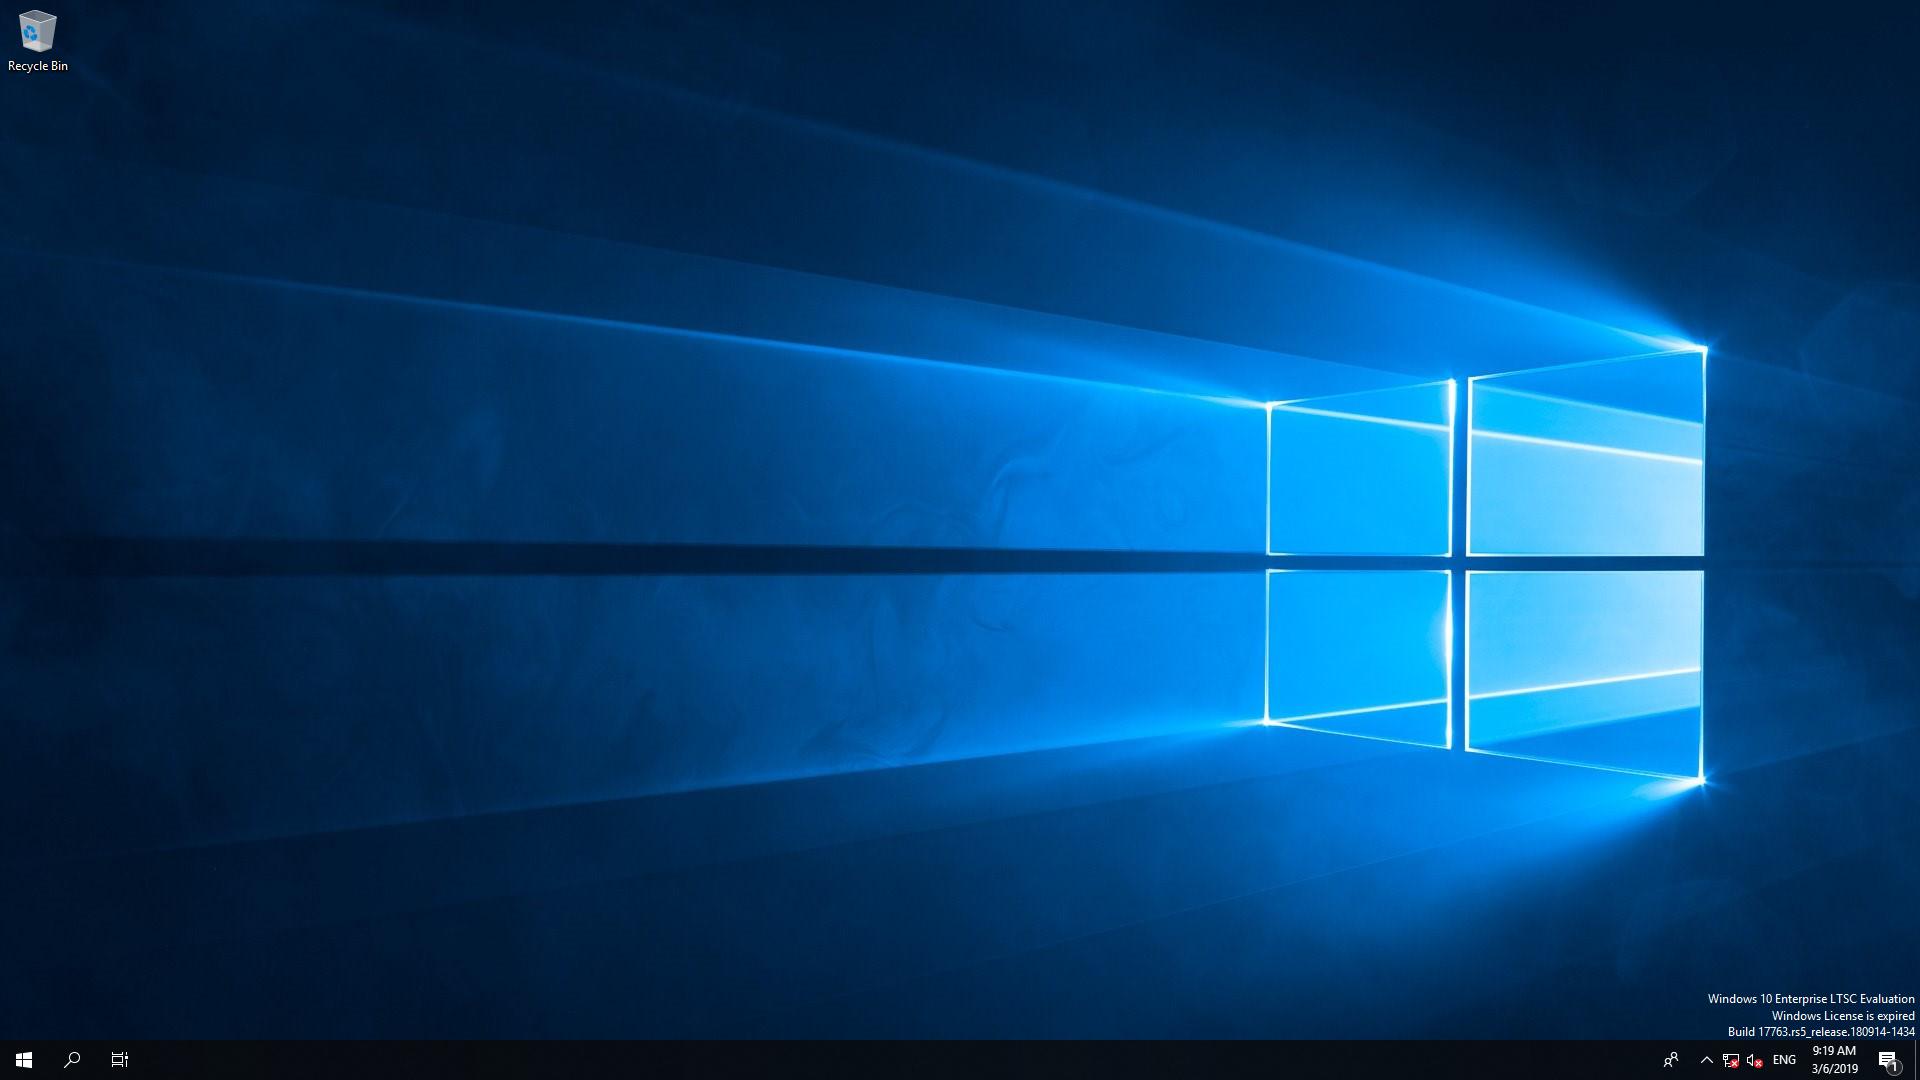 Установленный Windows 10 Enterprise LTSC x64